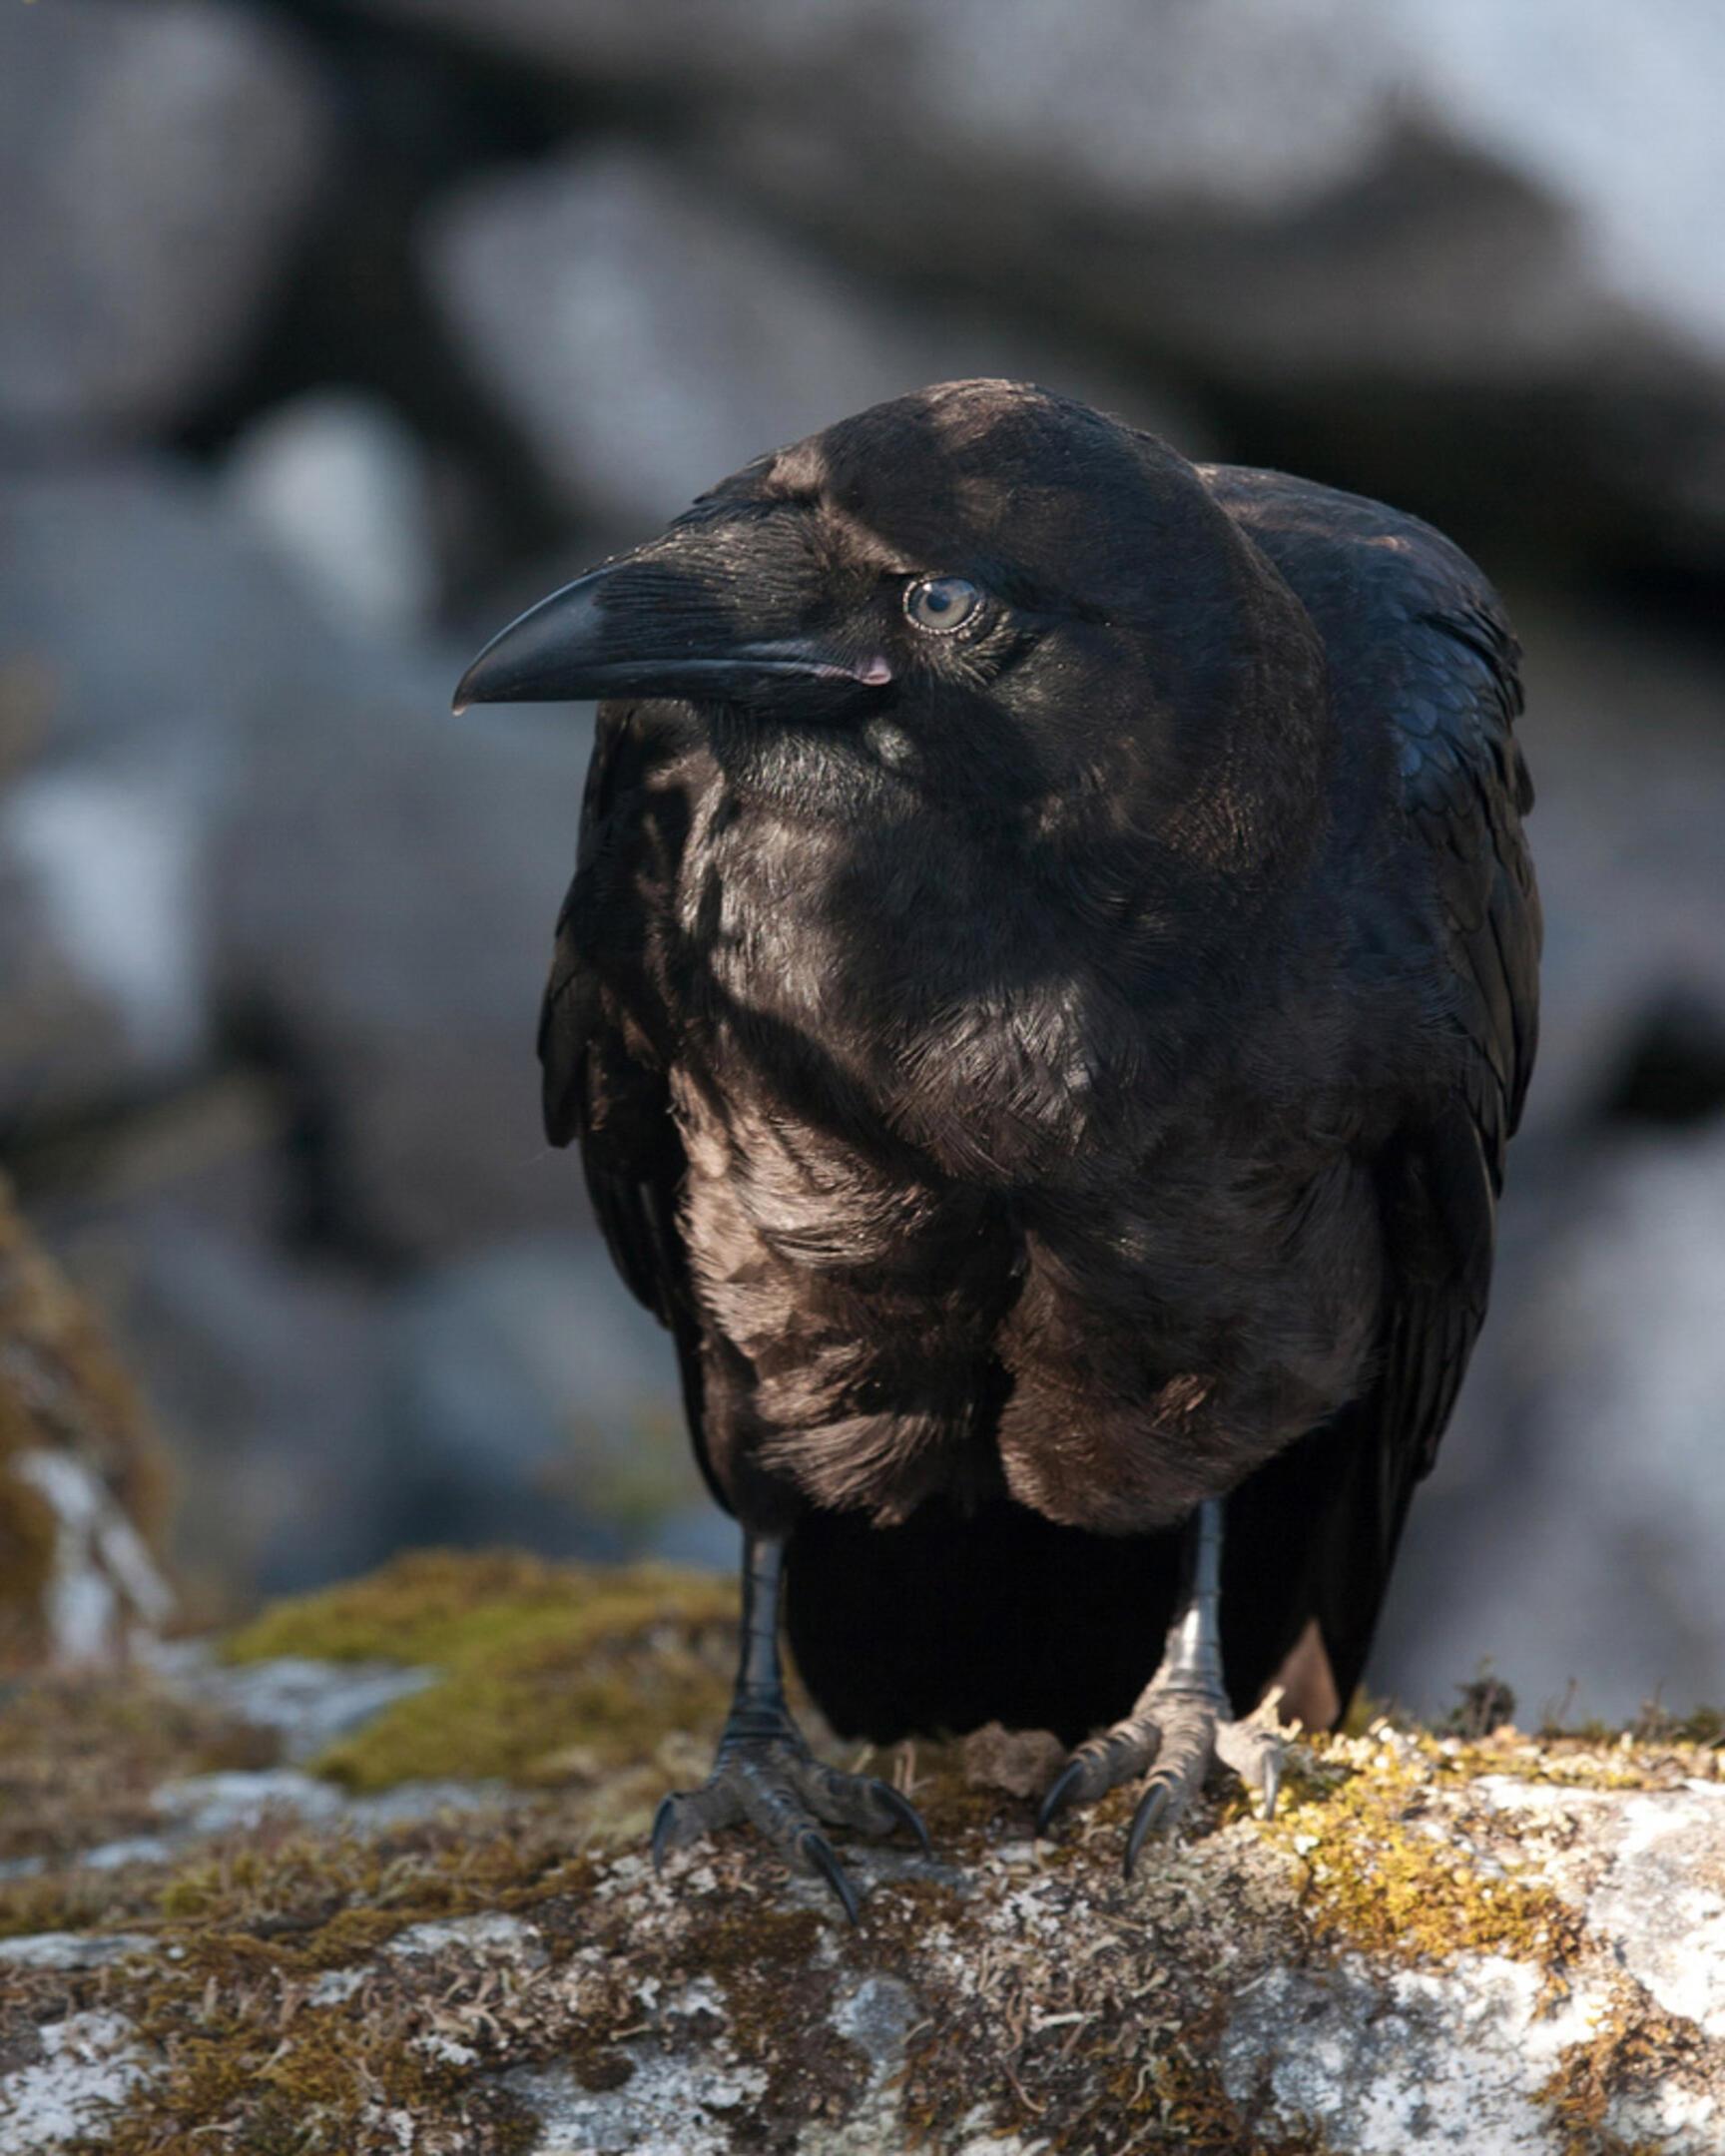 Adult raven photograph by Ron Hanna via https://www.audubon.org/field-guide/bird/common-raven#photo3